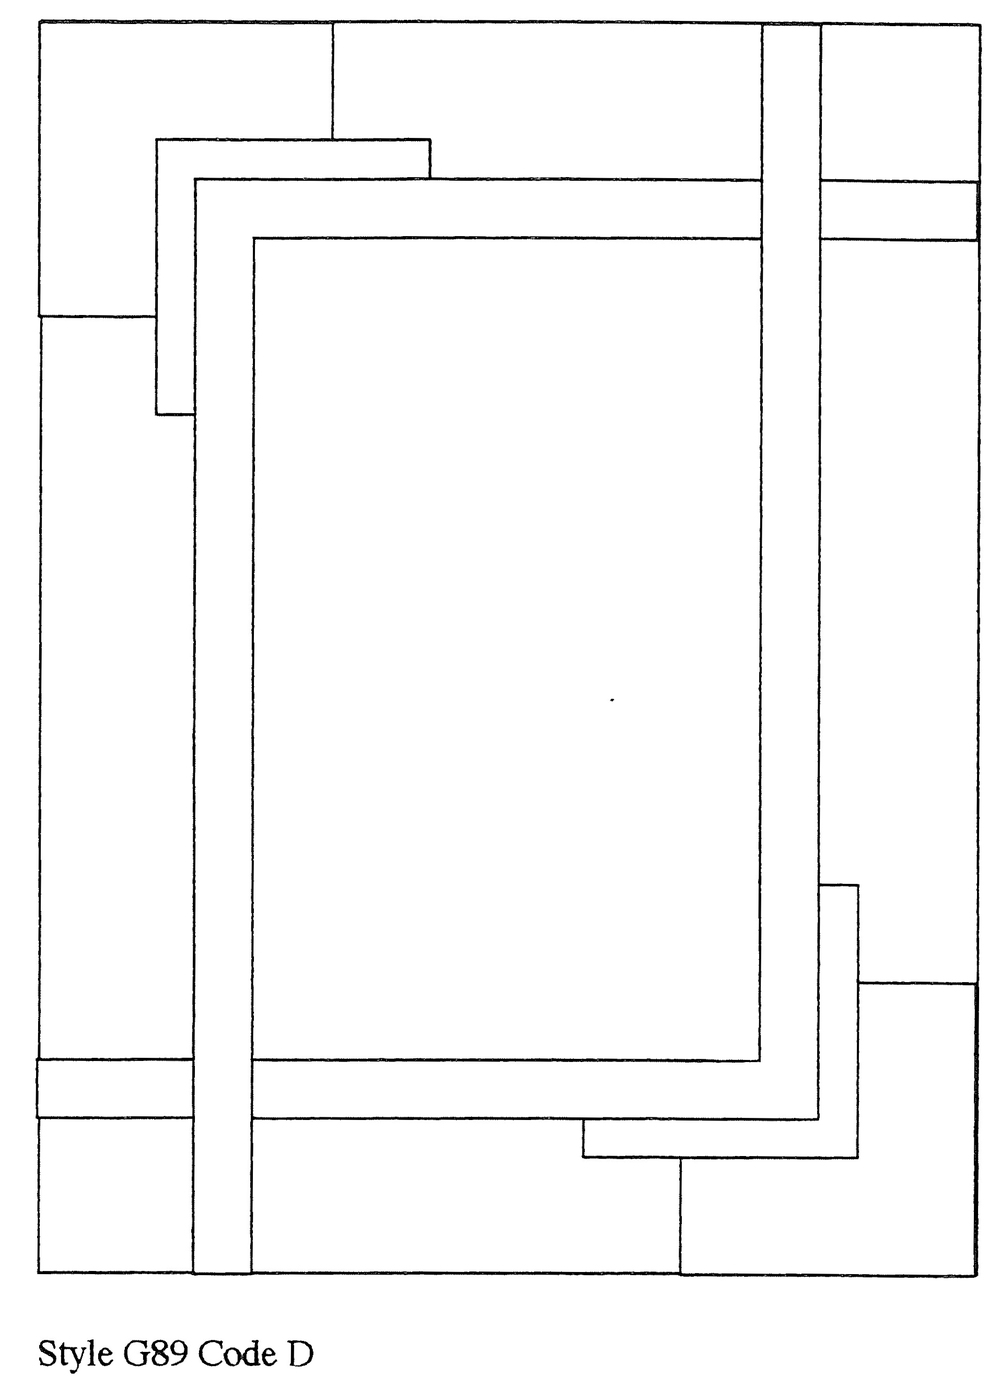 Page 4 copy 3.jpg